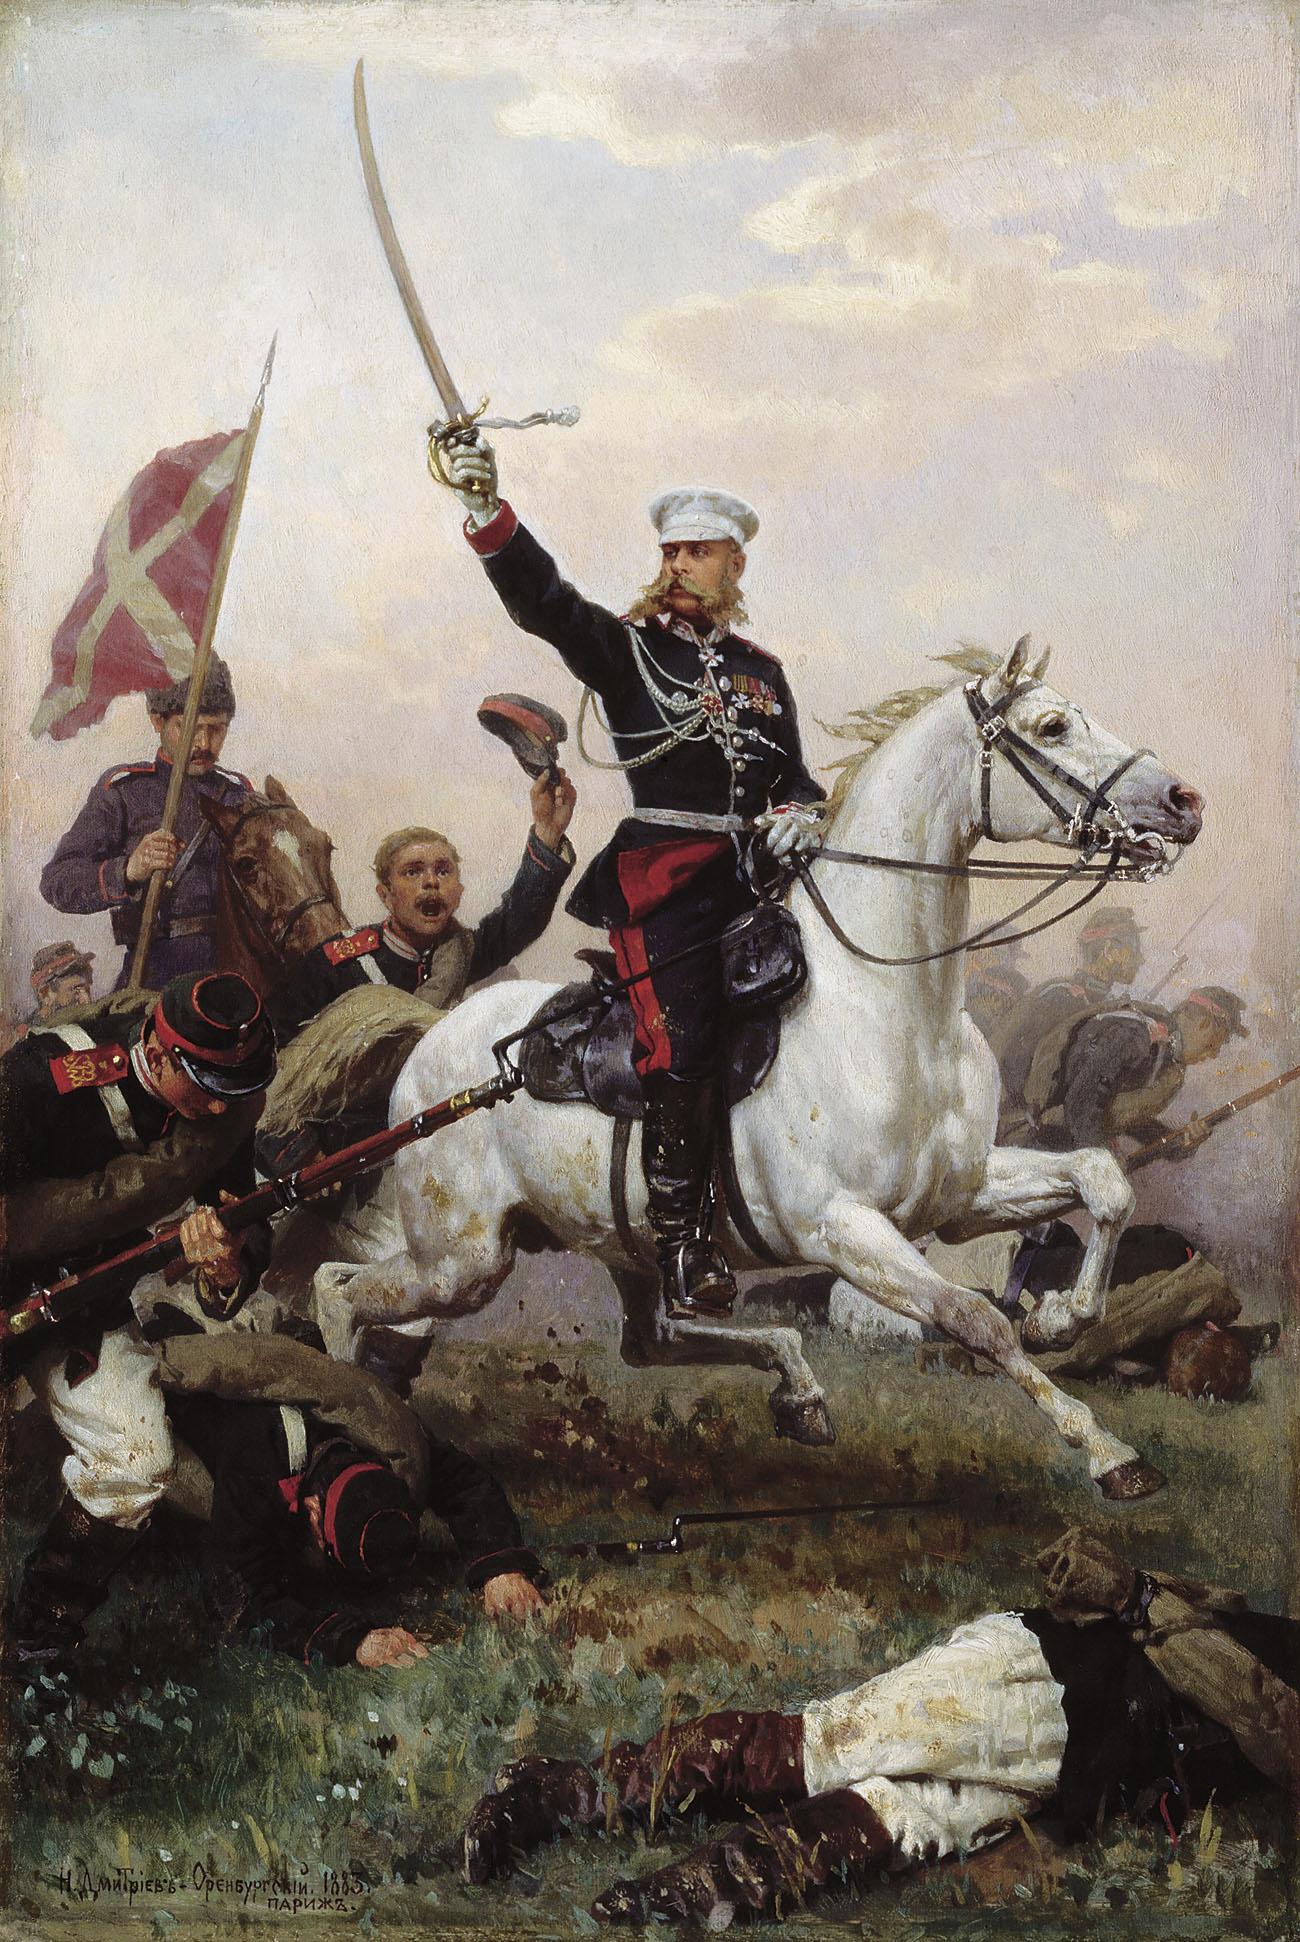 Н. Дмитриев-Оренбургский. Генерал Н. Д. скобелев на коне. 1883.